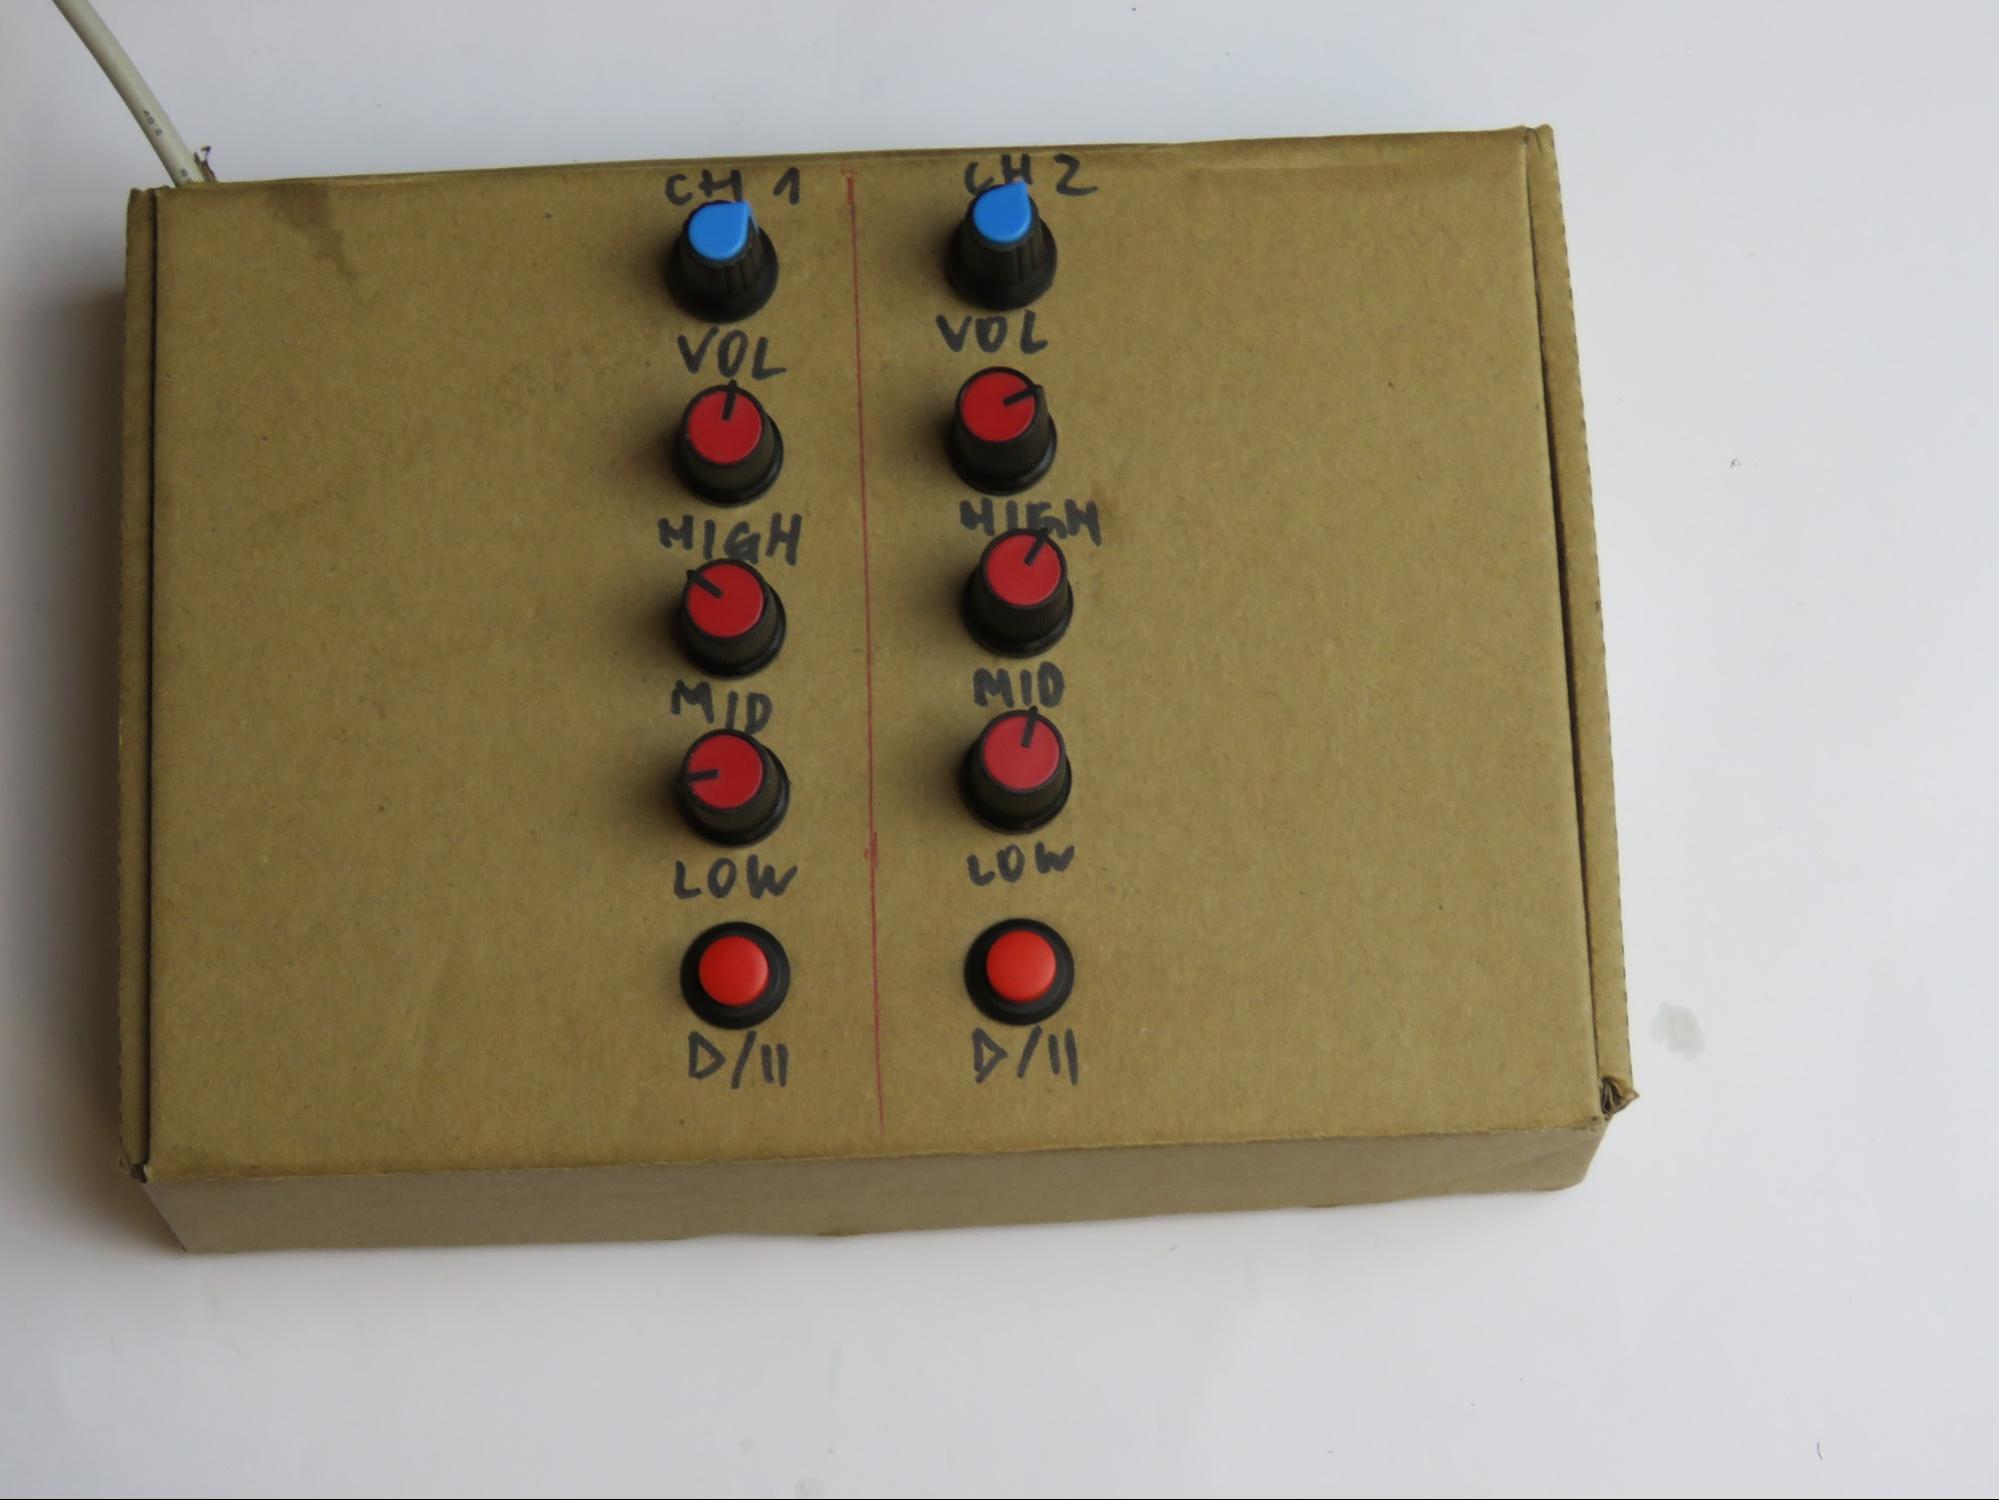 MIDI микшер на Arduino Pro Micro